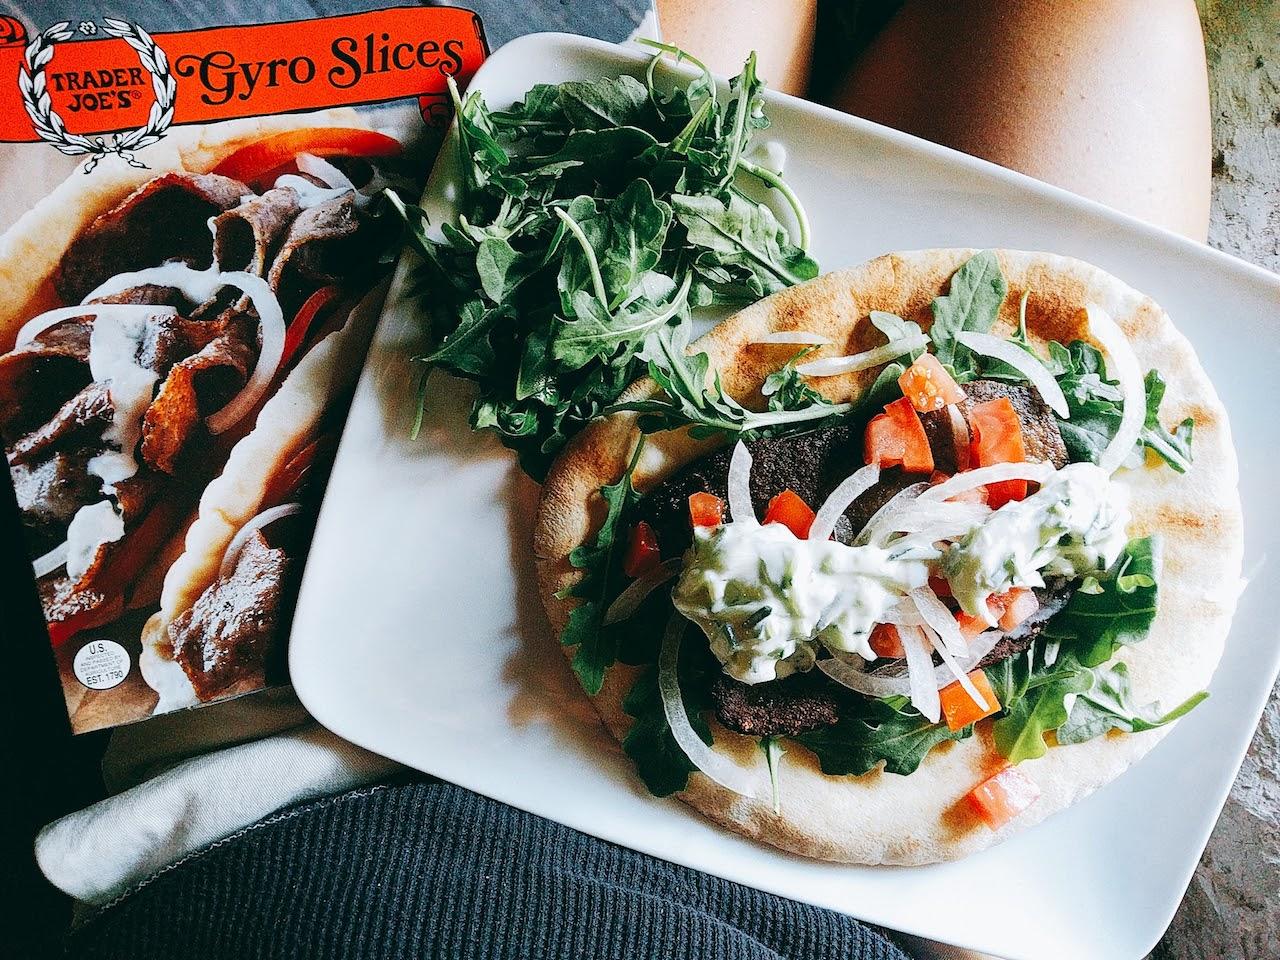 TJ'sの商品を使った即席レシピ:ギリシャ料理